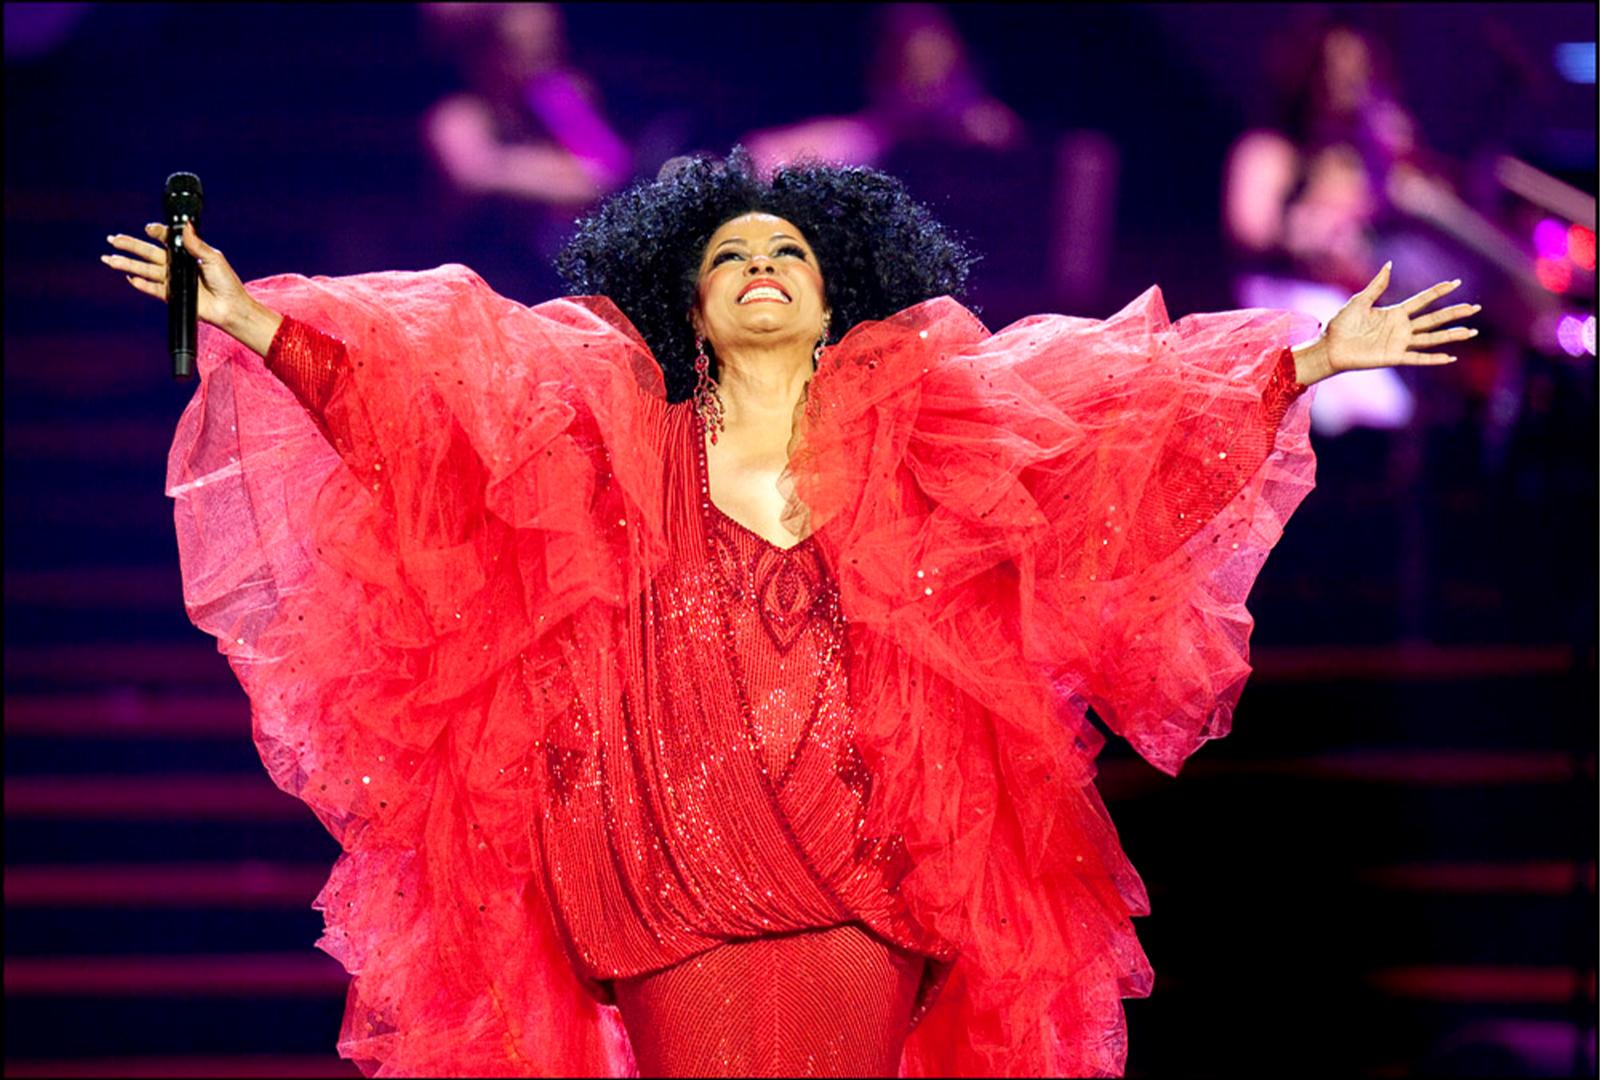 Diana Ross releasing new album, Thank You